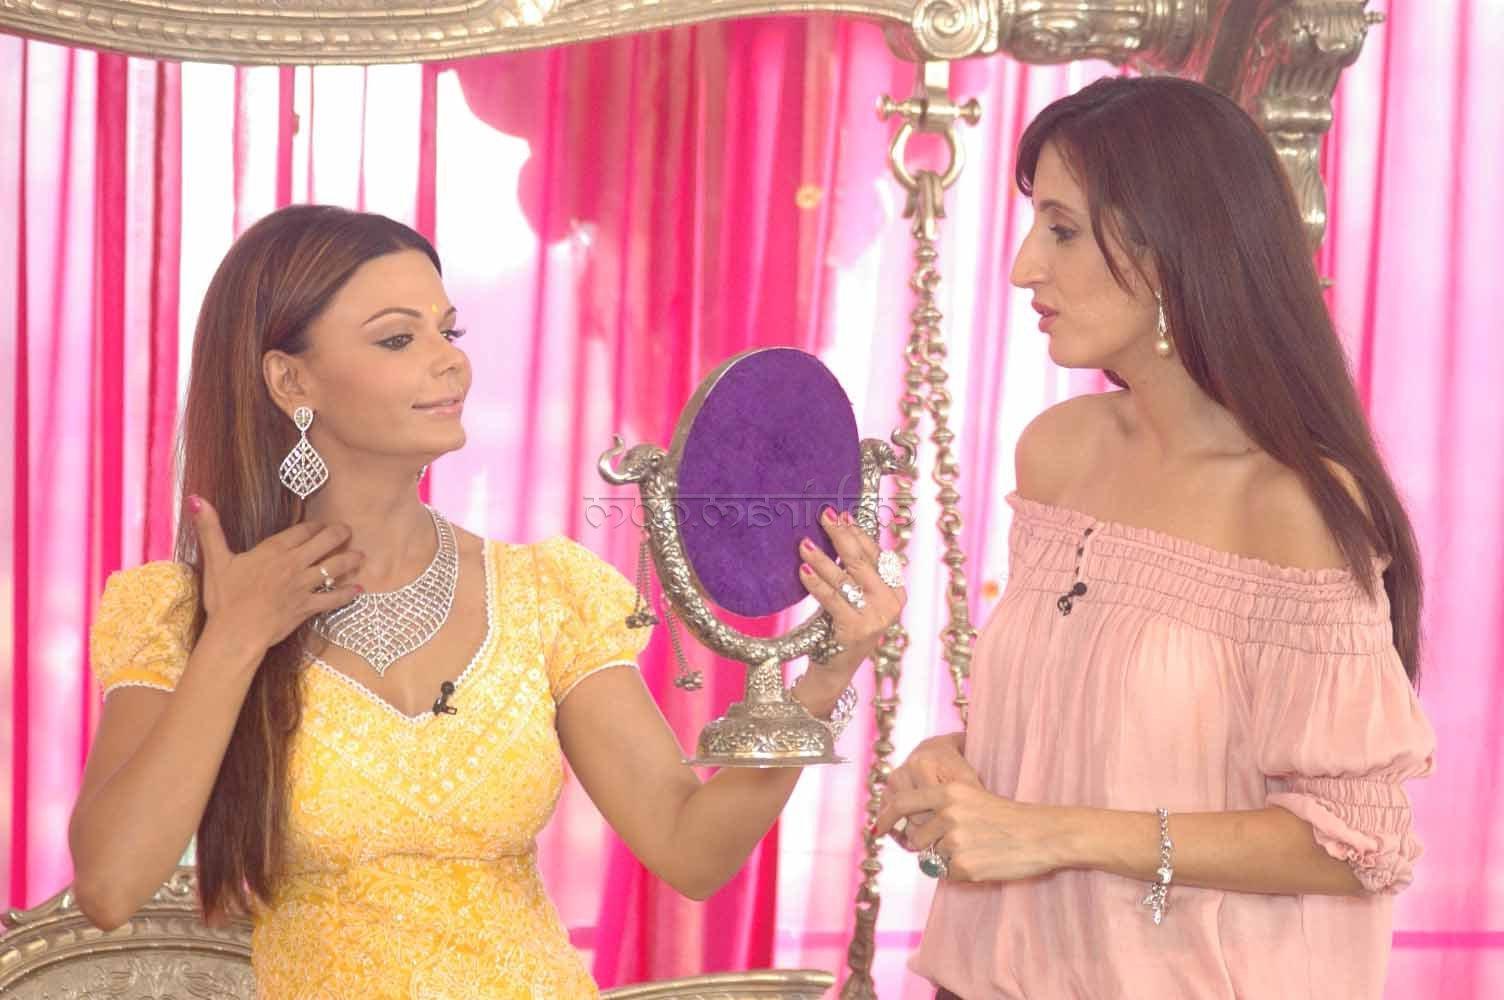 Linh\'s blog: Aishwarya Rai wedding pics